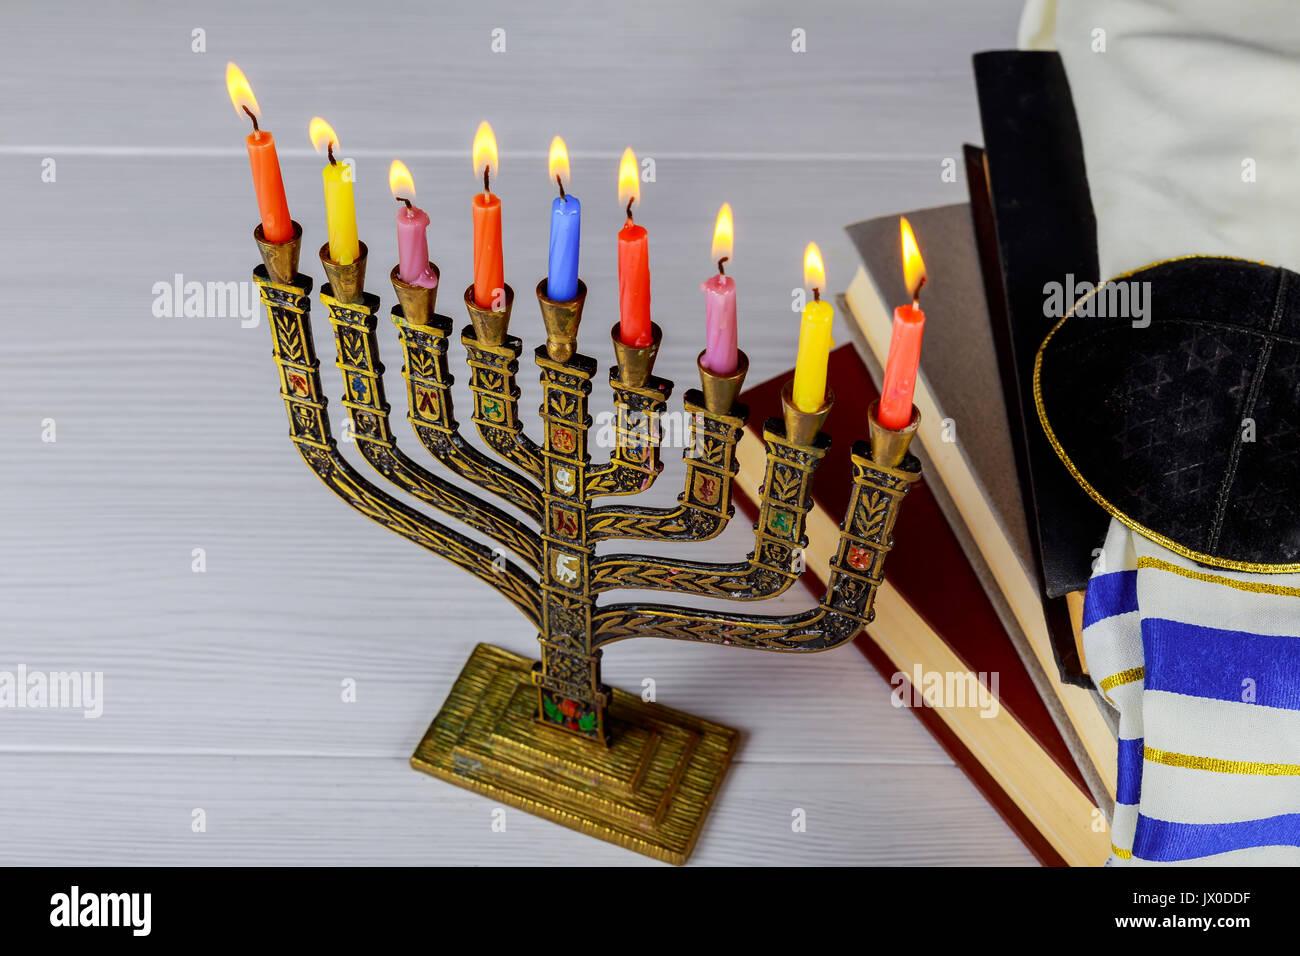 A still life composed of elements of the Jewish Chanukah Hanukkah festival. jewish holiday Hanukkah - Stock Image